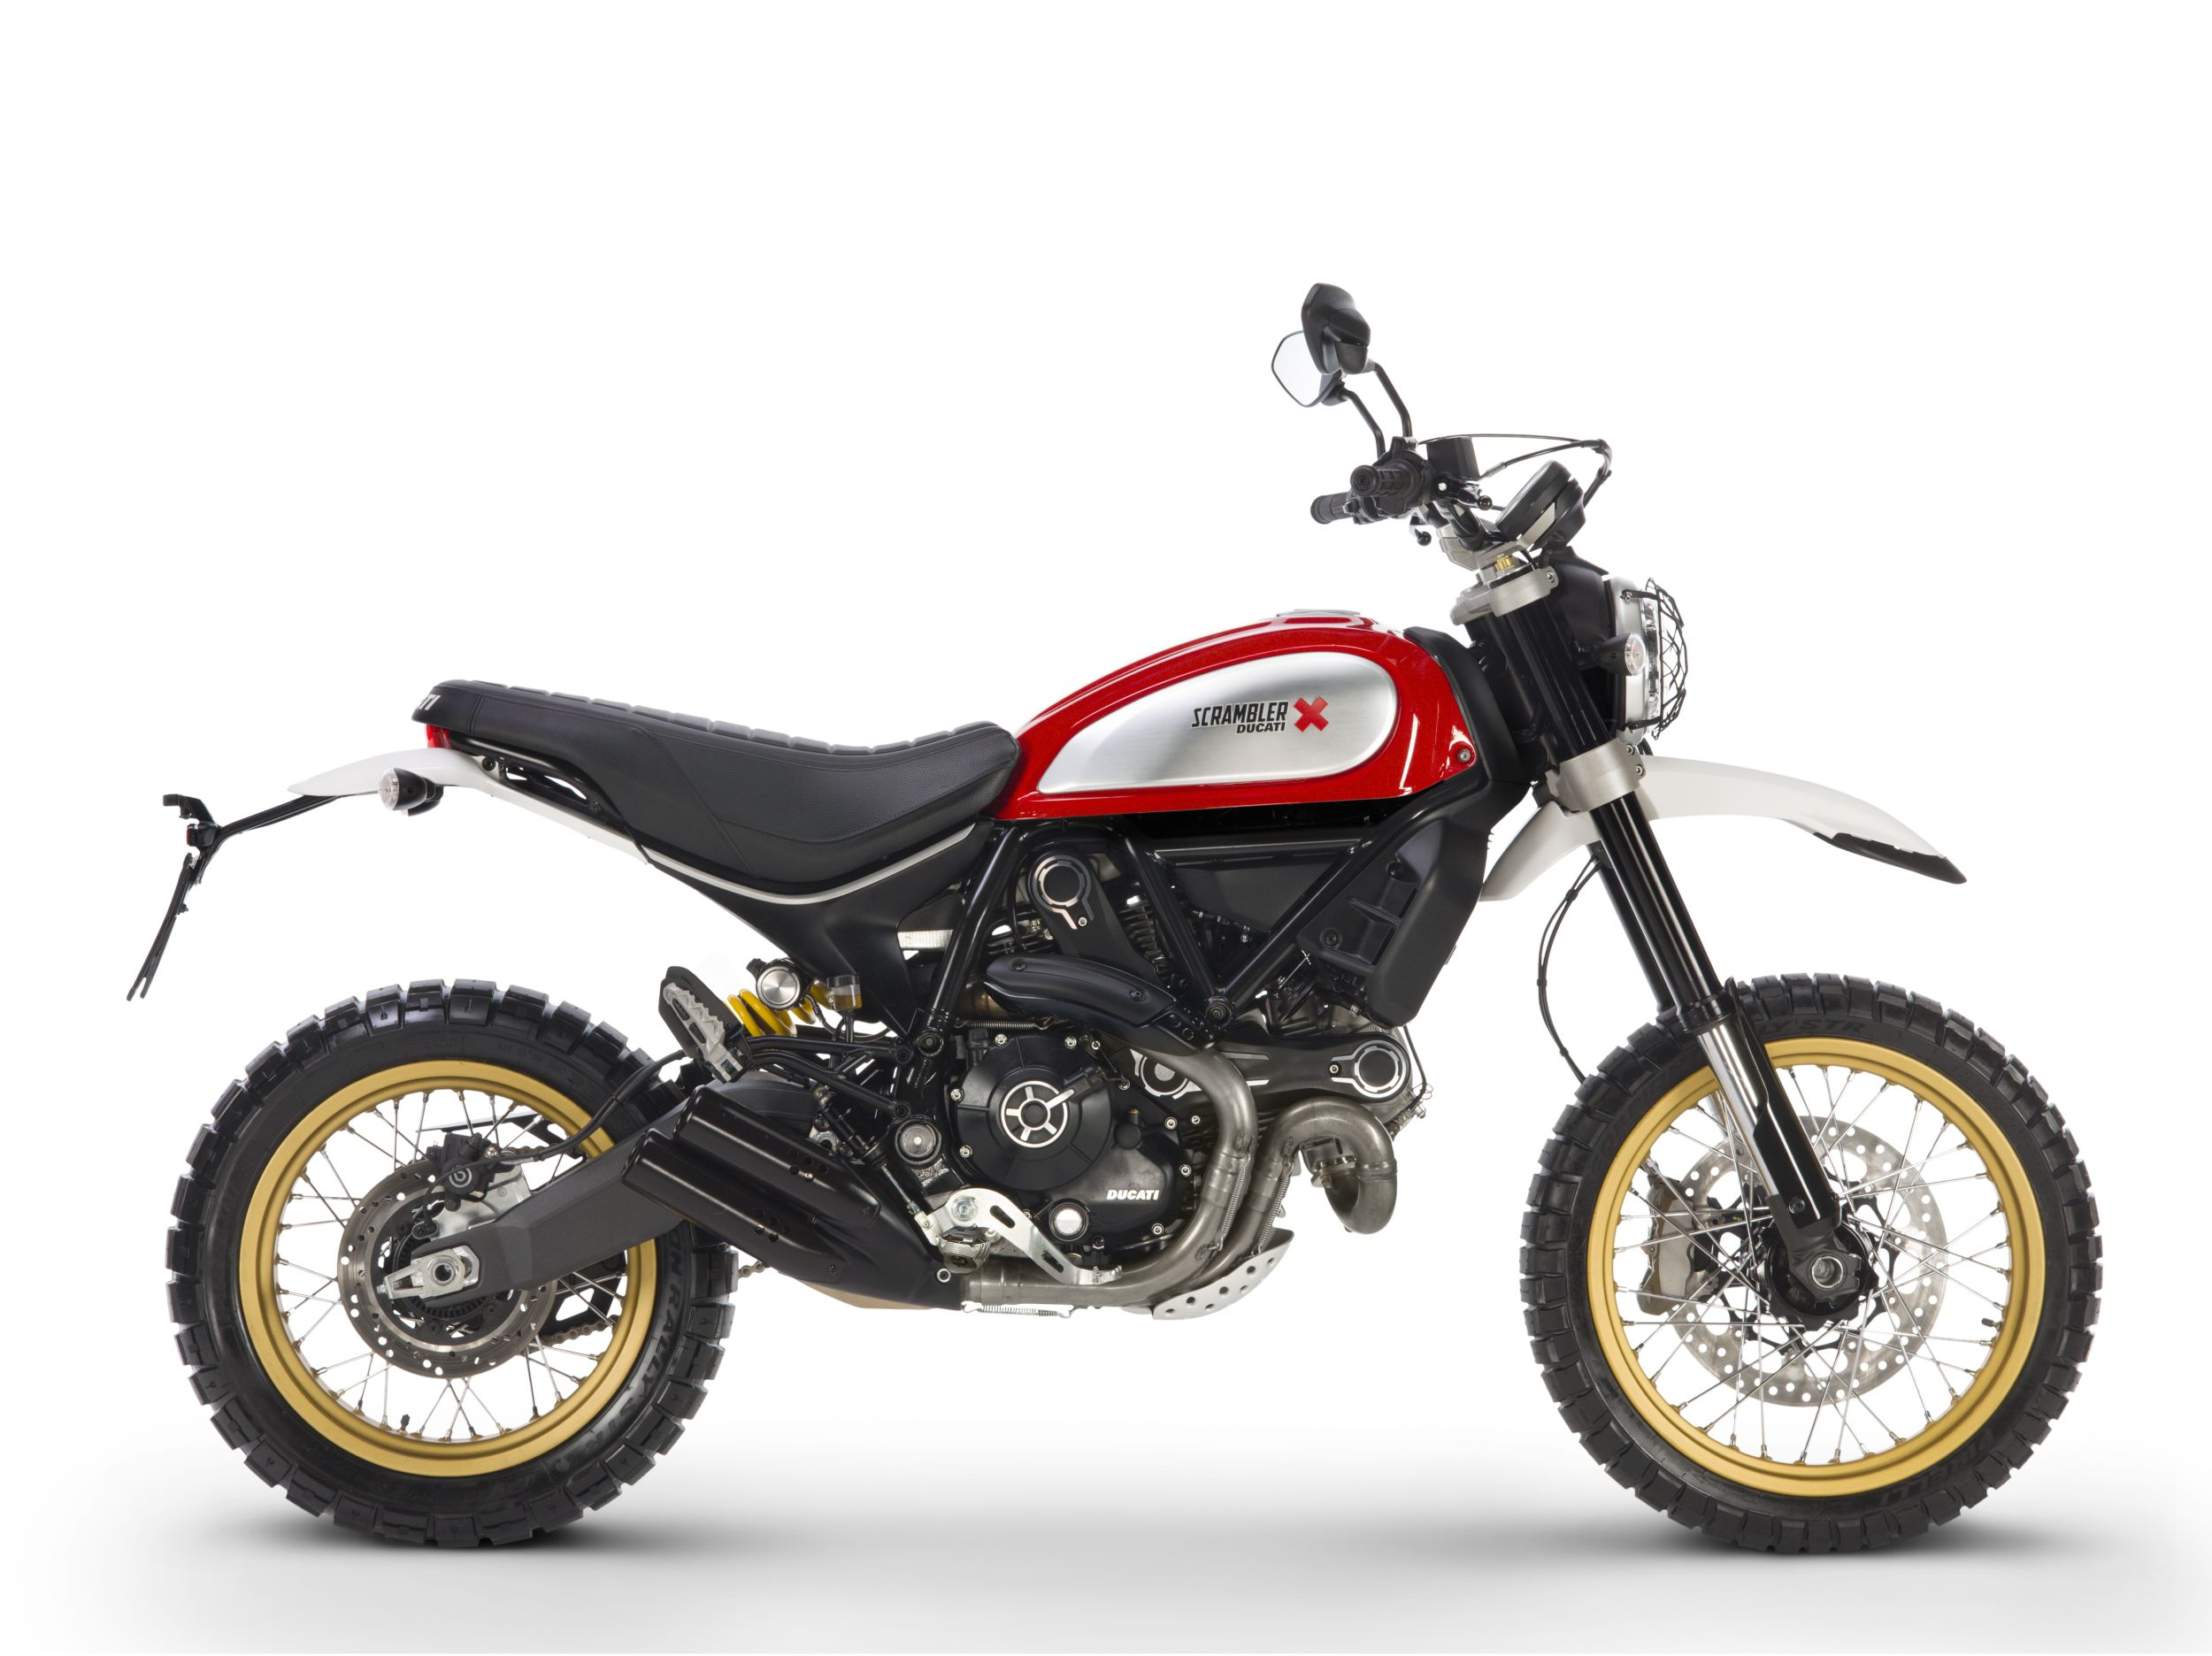 МОТОЦИКЛ DUCATI SCRAMBLER DESERT SLED ― Артмото - купить квадроцикл в украине и харькове, мотоцикл, снегоход, скутер, мопед, электромобиль